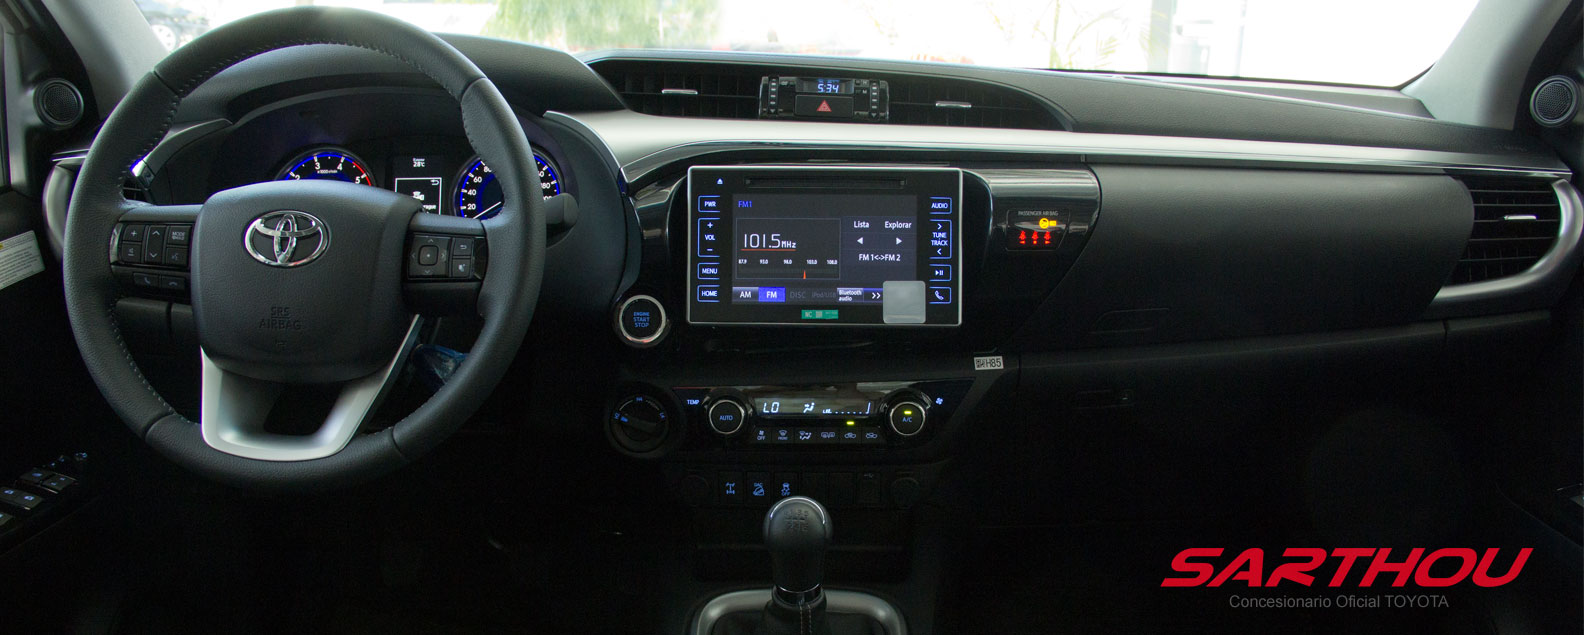 Toyota Hilux Sarthou Buenos Aires